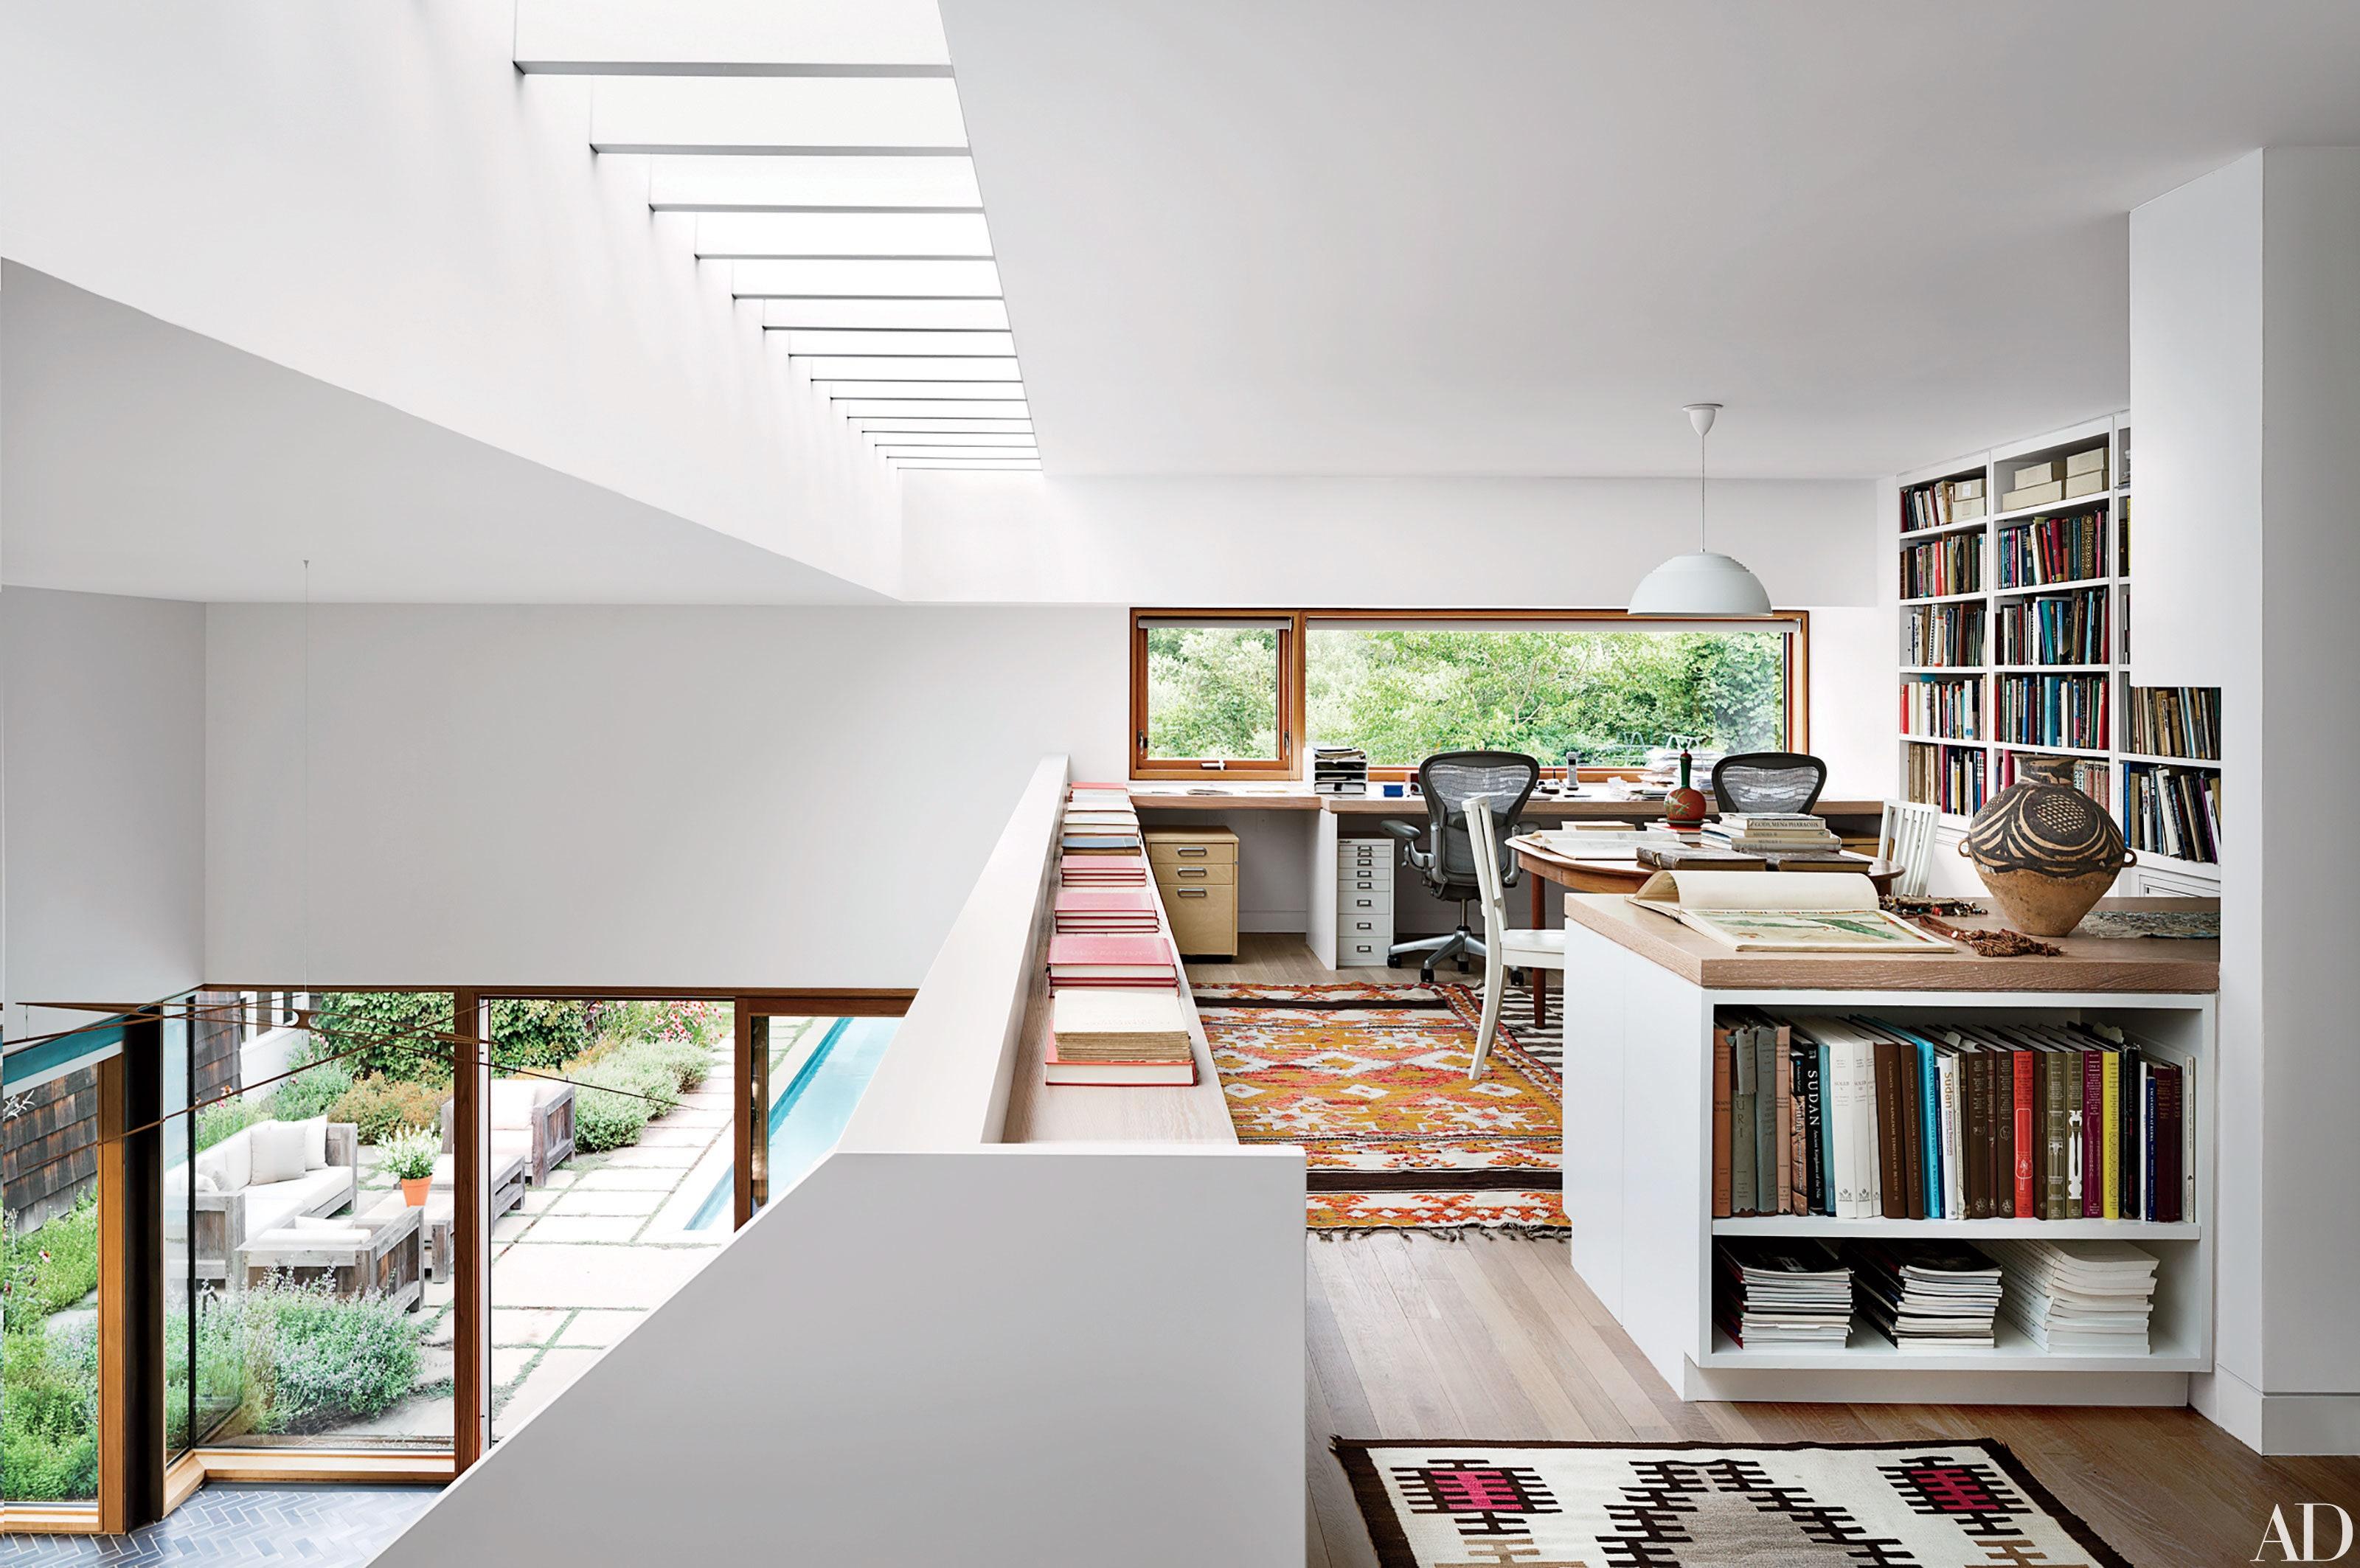 Mezzanine office | Source: architecturaldigest.com